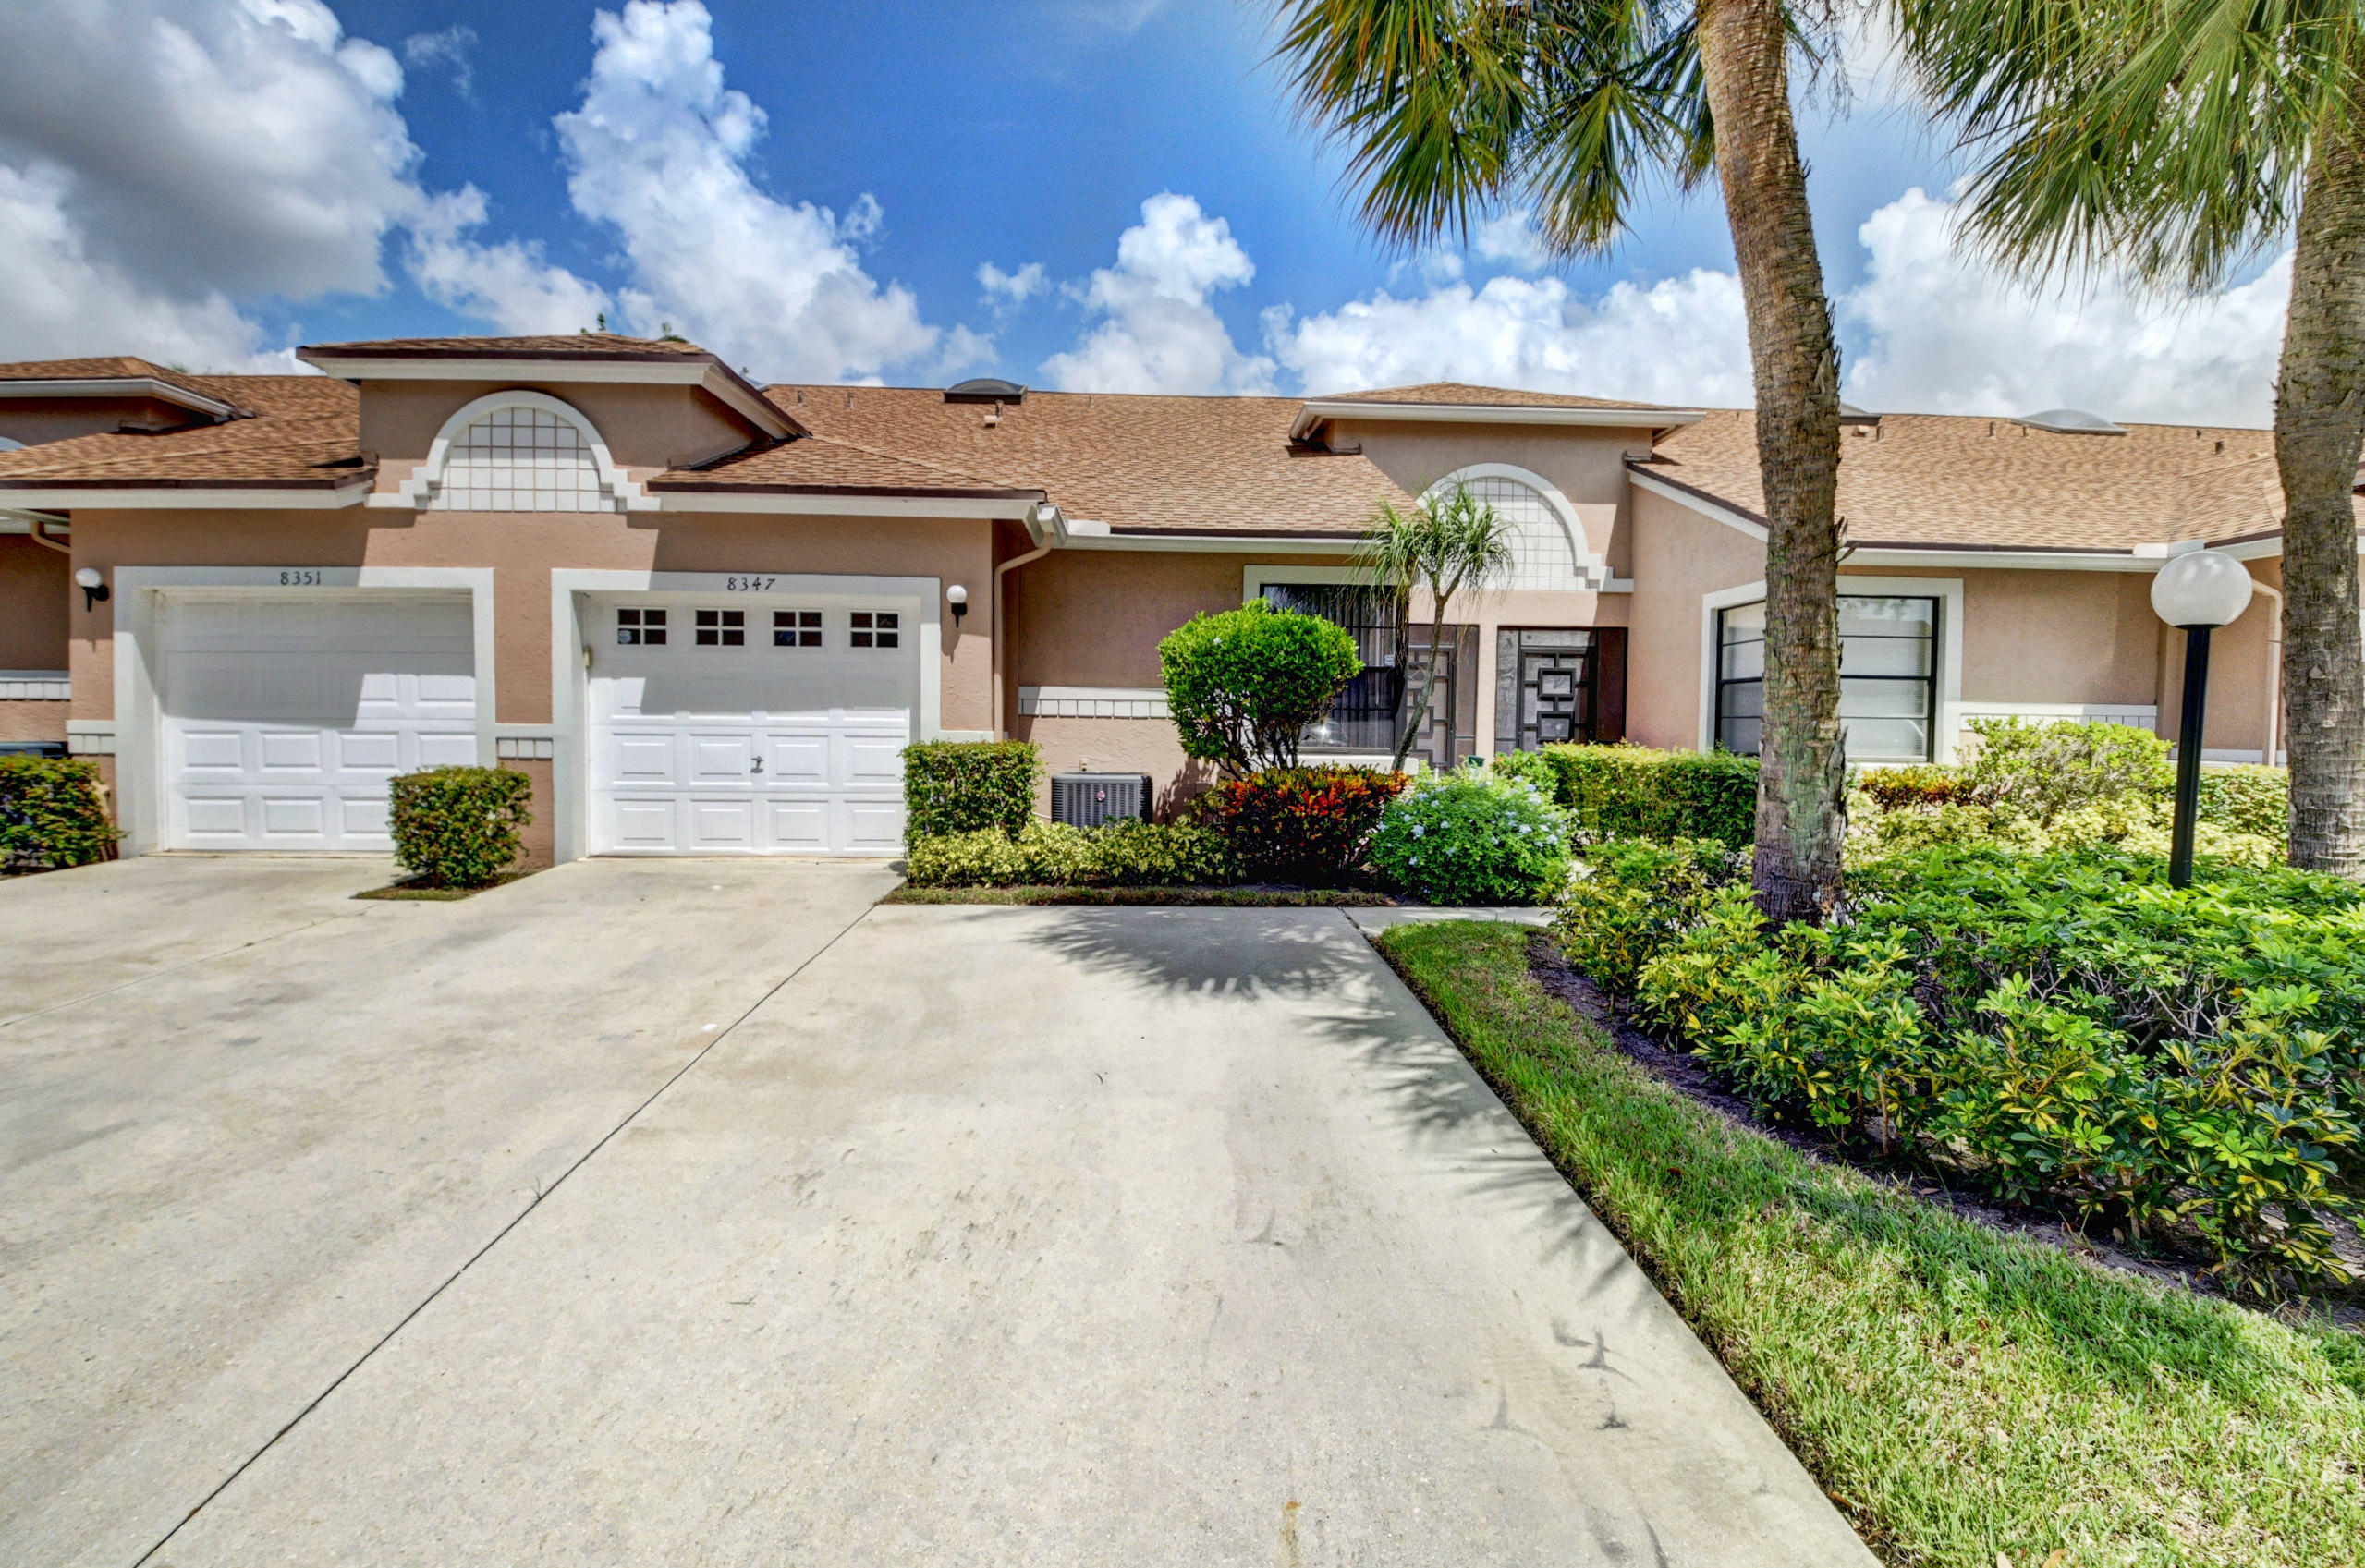 8347 Sunmeadow Lane  Boca Raton FL 33496